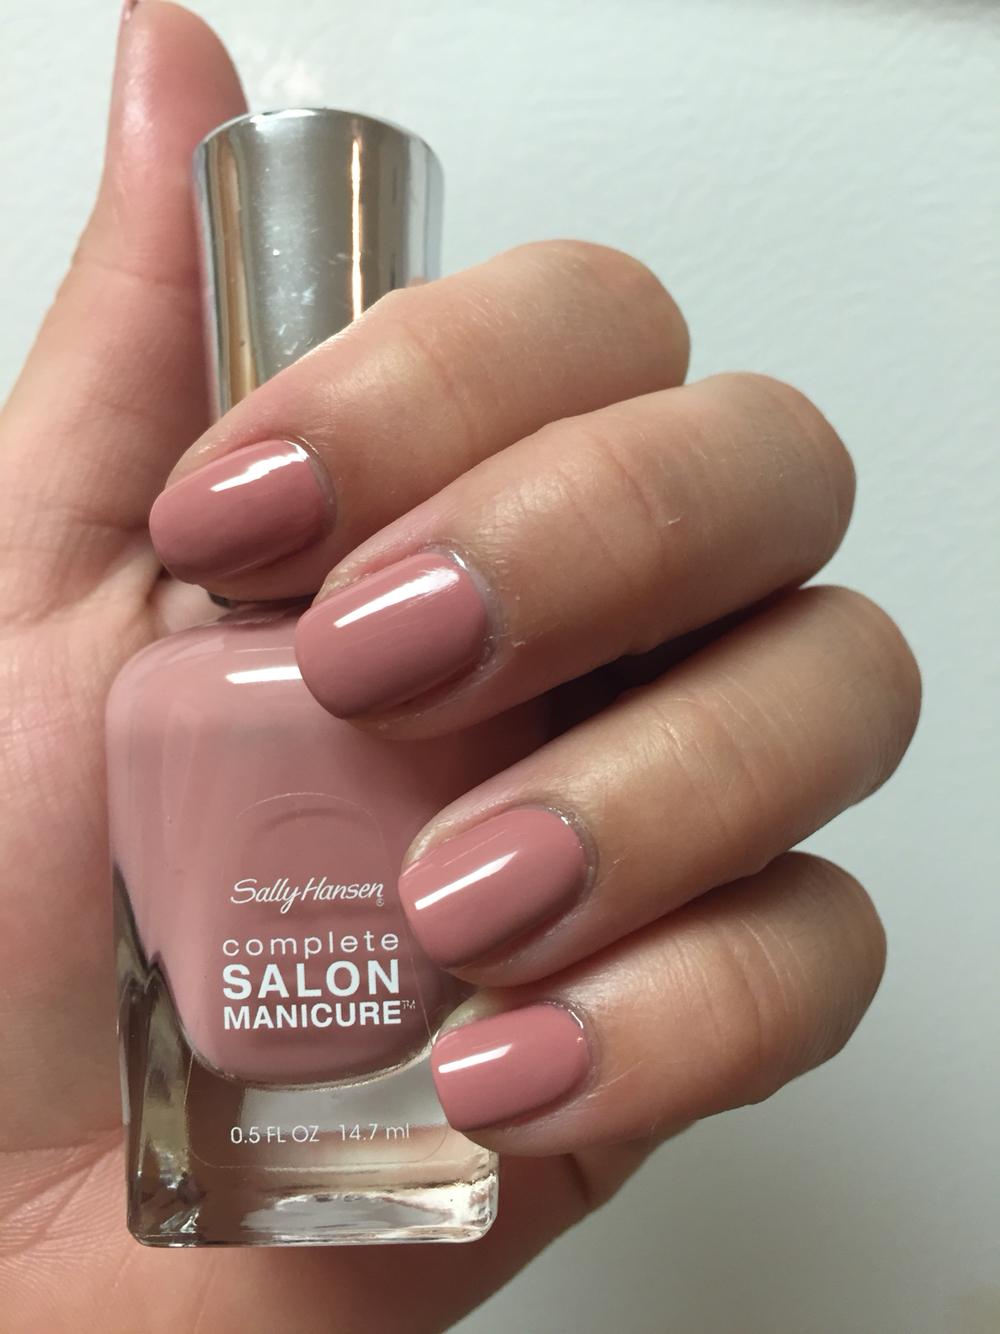 Sally hansen complete salon manicure nail polish choose for Salon manicure